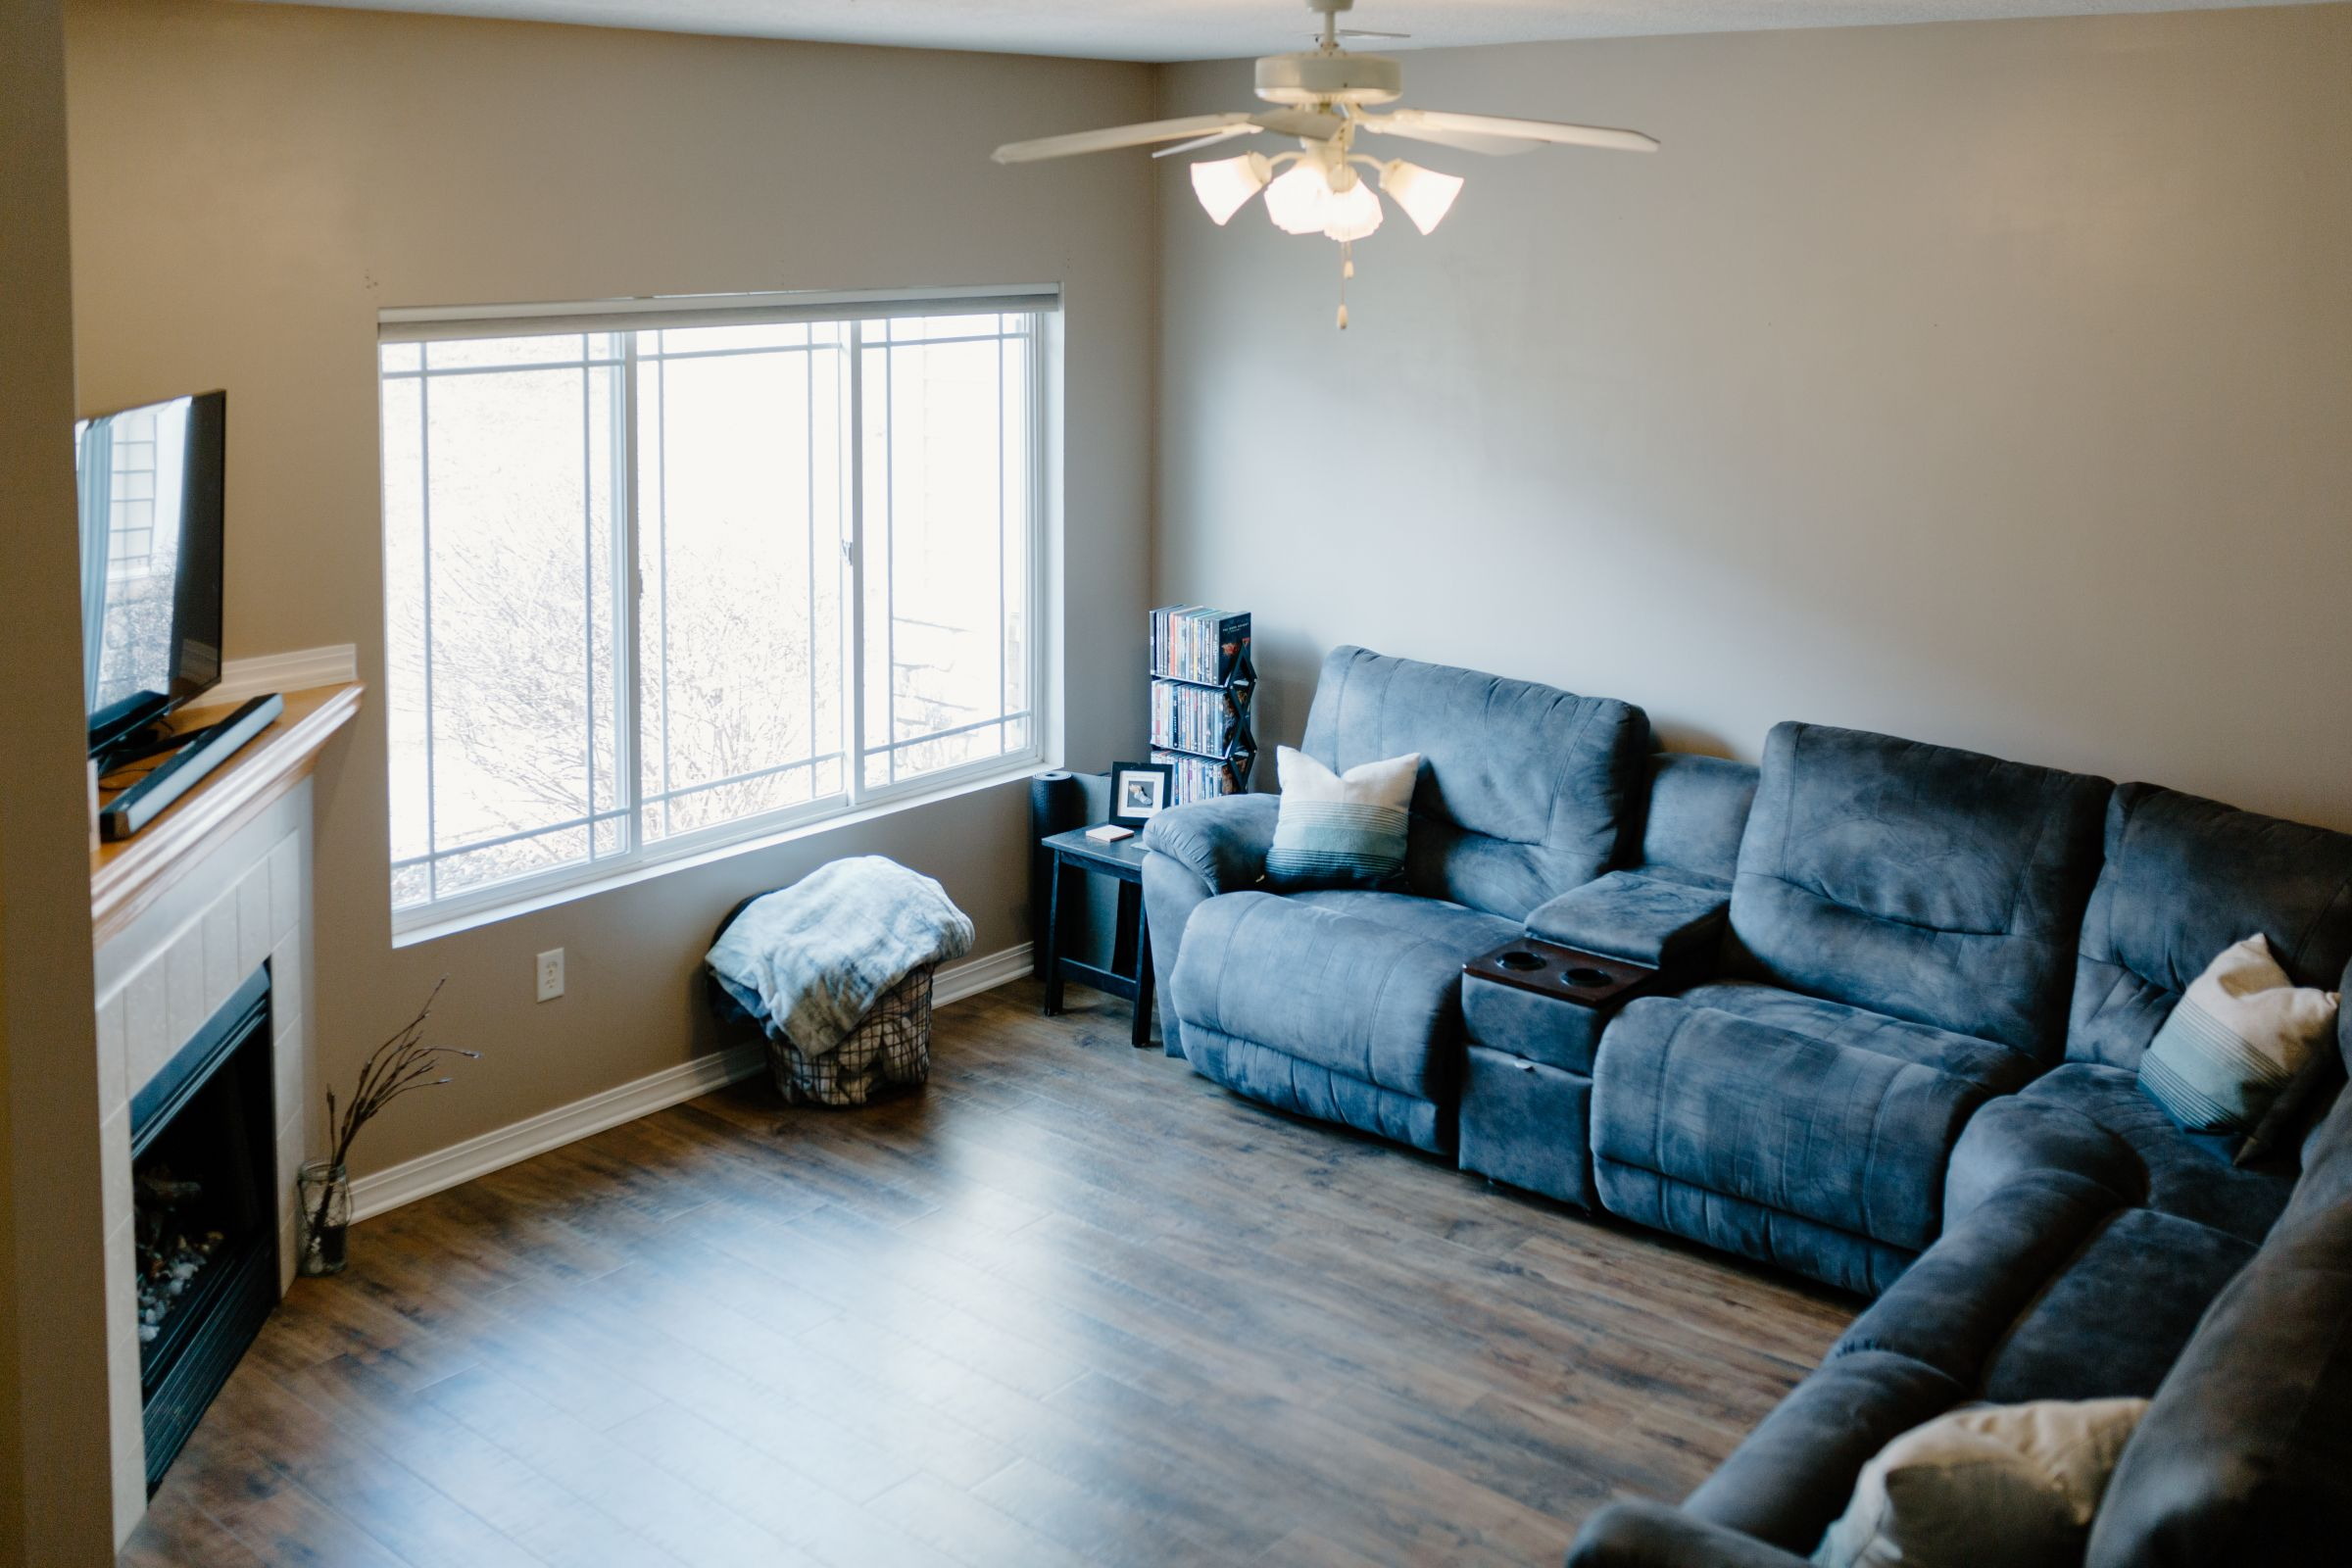 residential-polk-county-iowa-0-acres-listing-number-15418-6-2021-03-22-161816.jpg